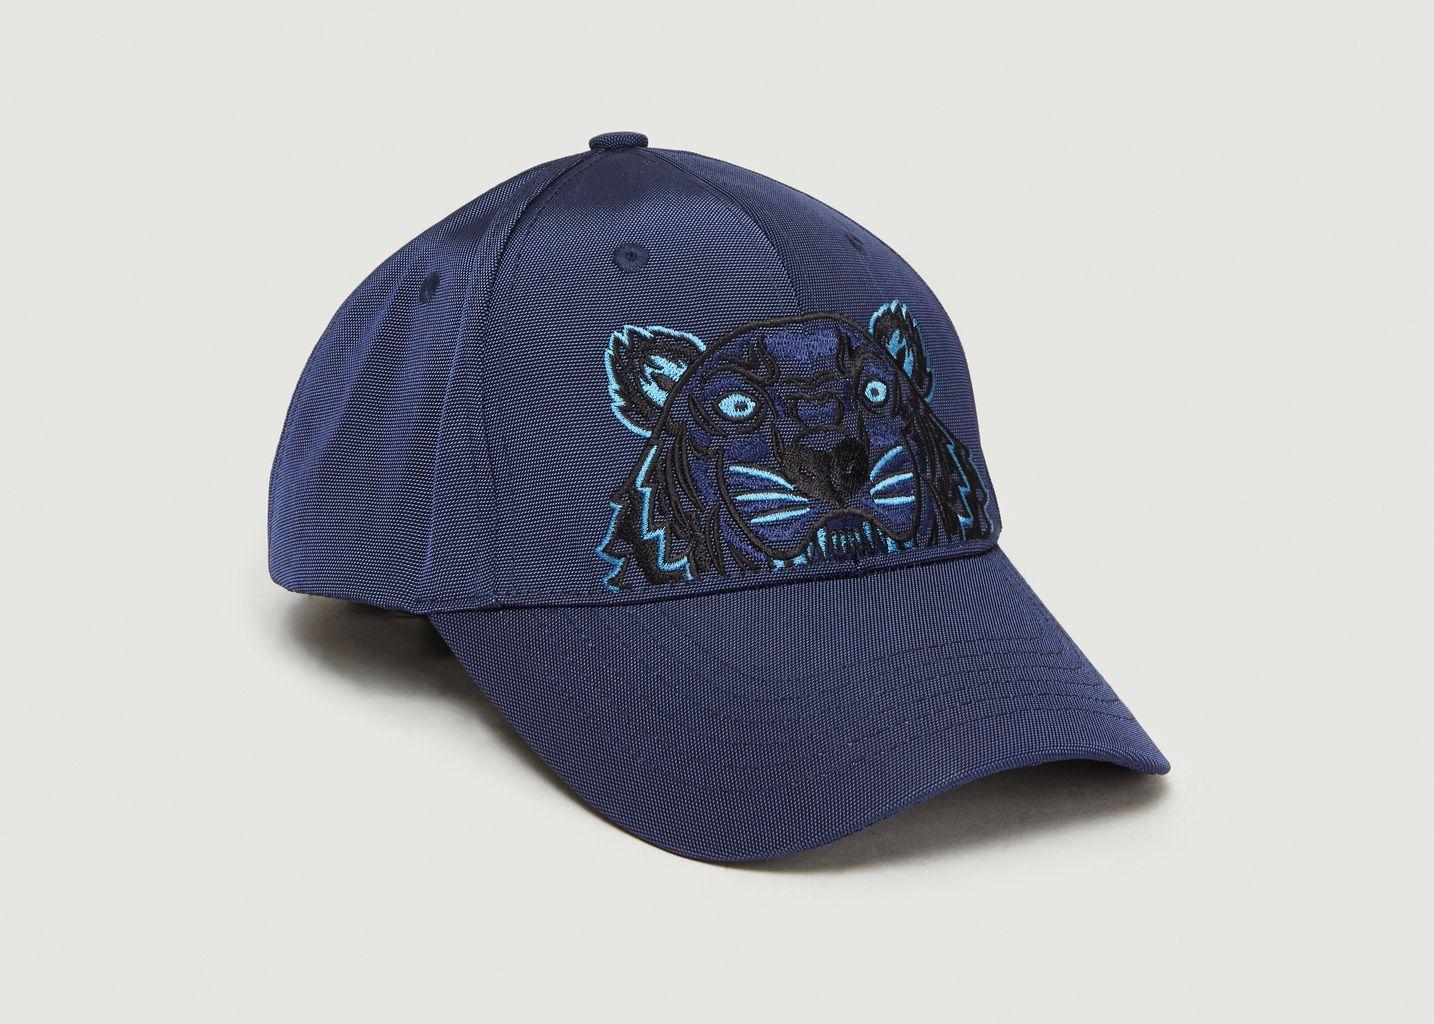 Casquette Tigre Bleu Marine Kenzo   L Exception 70bb22ee031